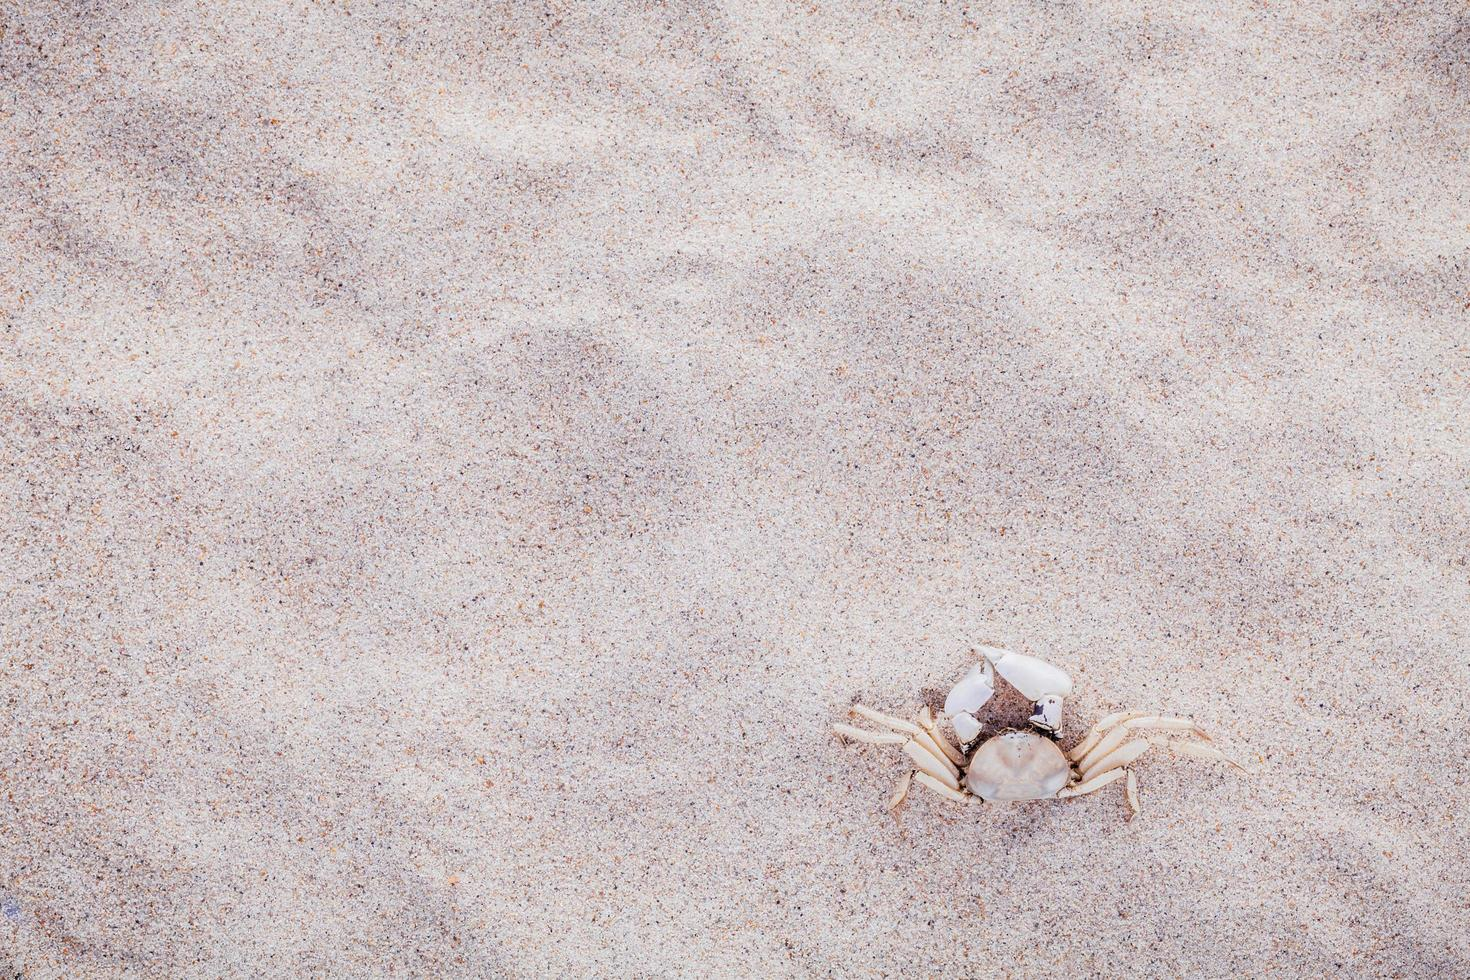 caranguejo branco na areia foto